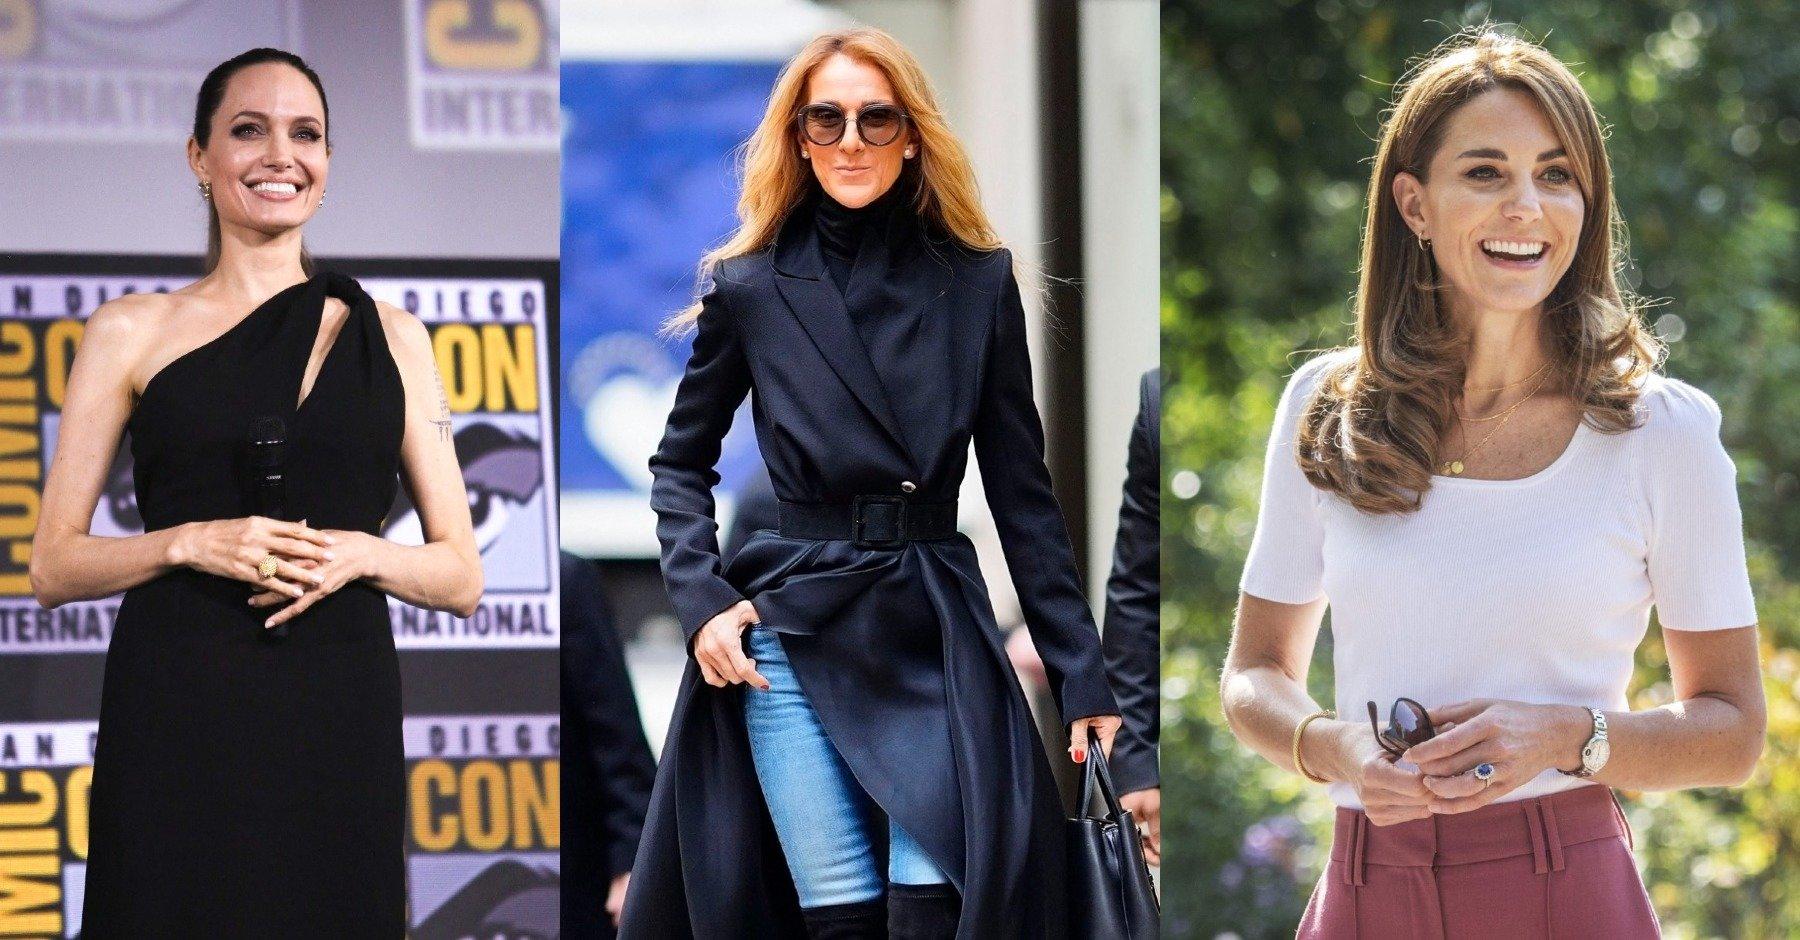 13 célébrités féminines jugées trop maigres